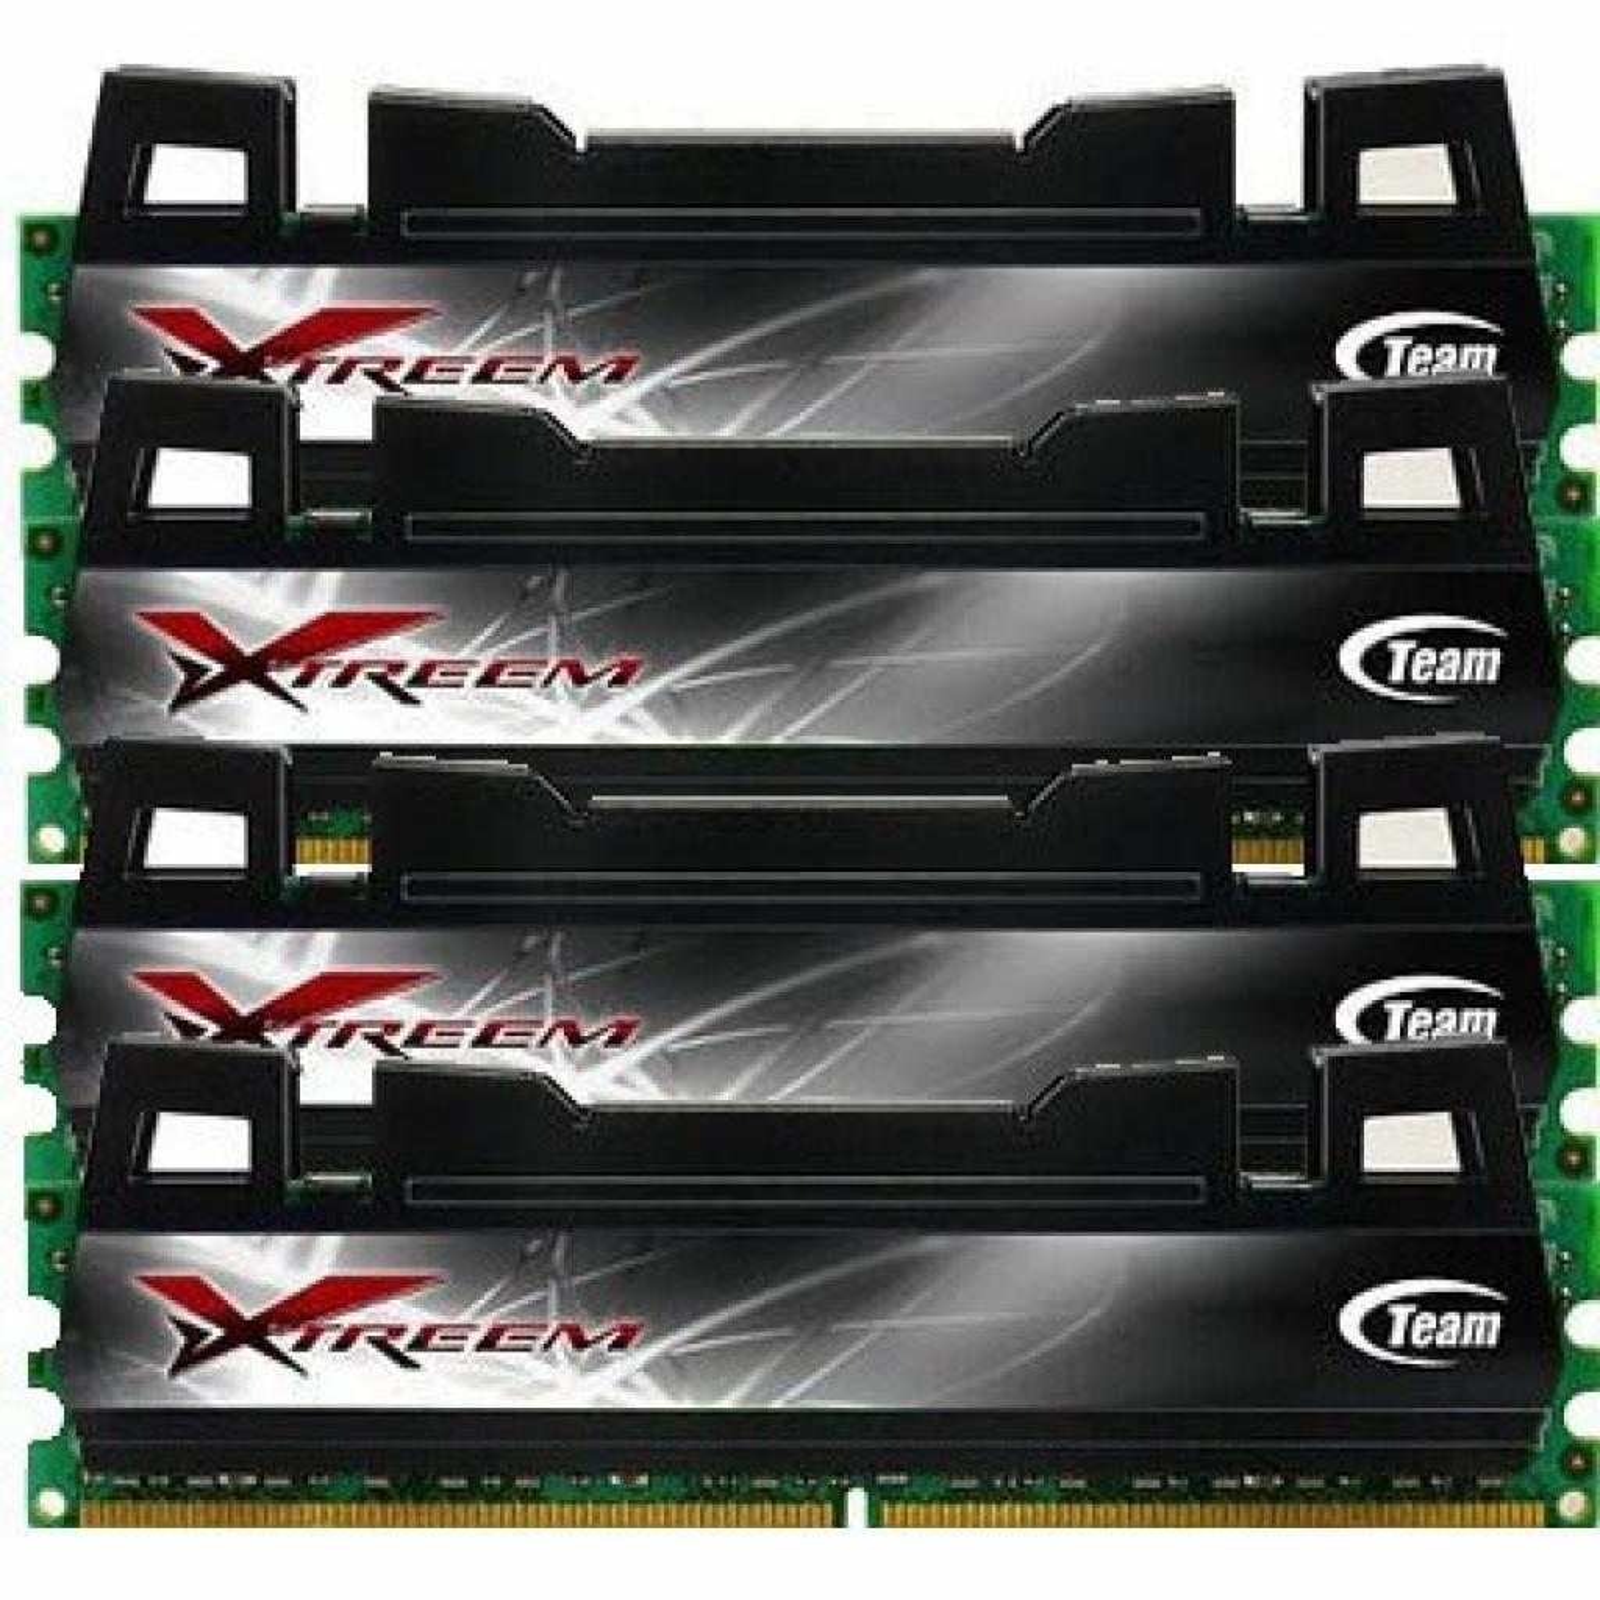 Модуль памяти для компьютера DDR3 16GB (4x4GB) 1866 MHz Team (TDD316G1866HC11QC01)